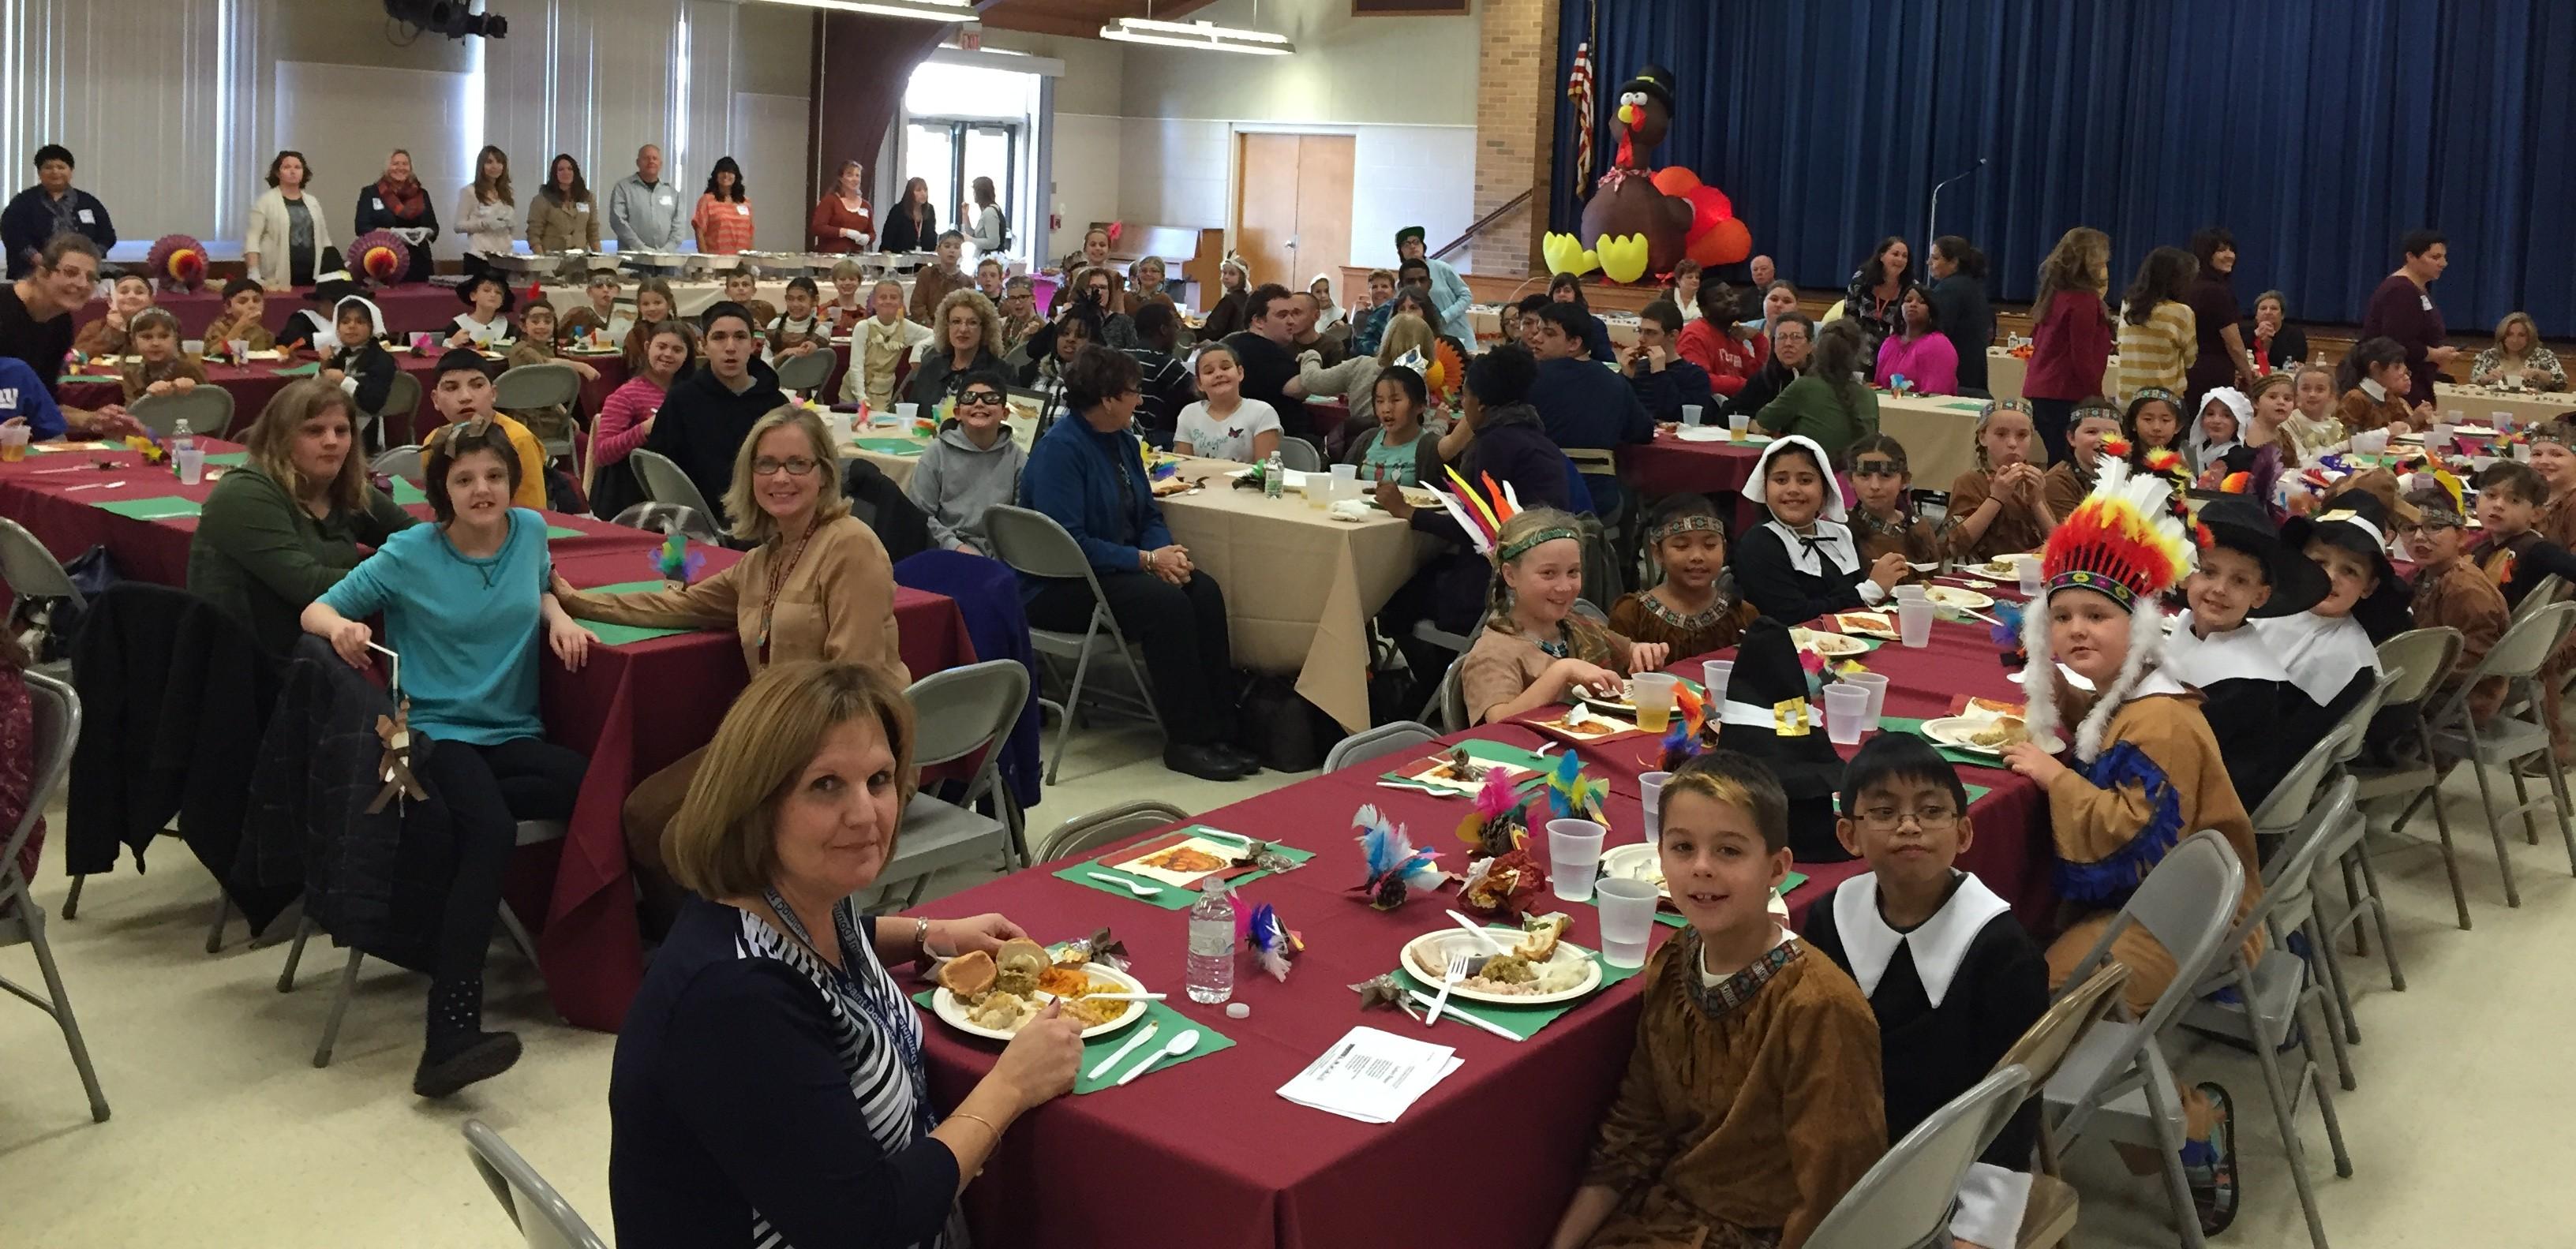 St. Dominic School, Brick, hosts a Thanksgiving feast, Nov. 23, 2015. (Photo: Daniel Nee)